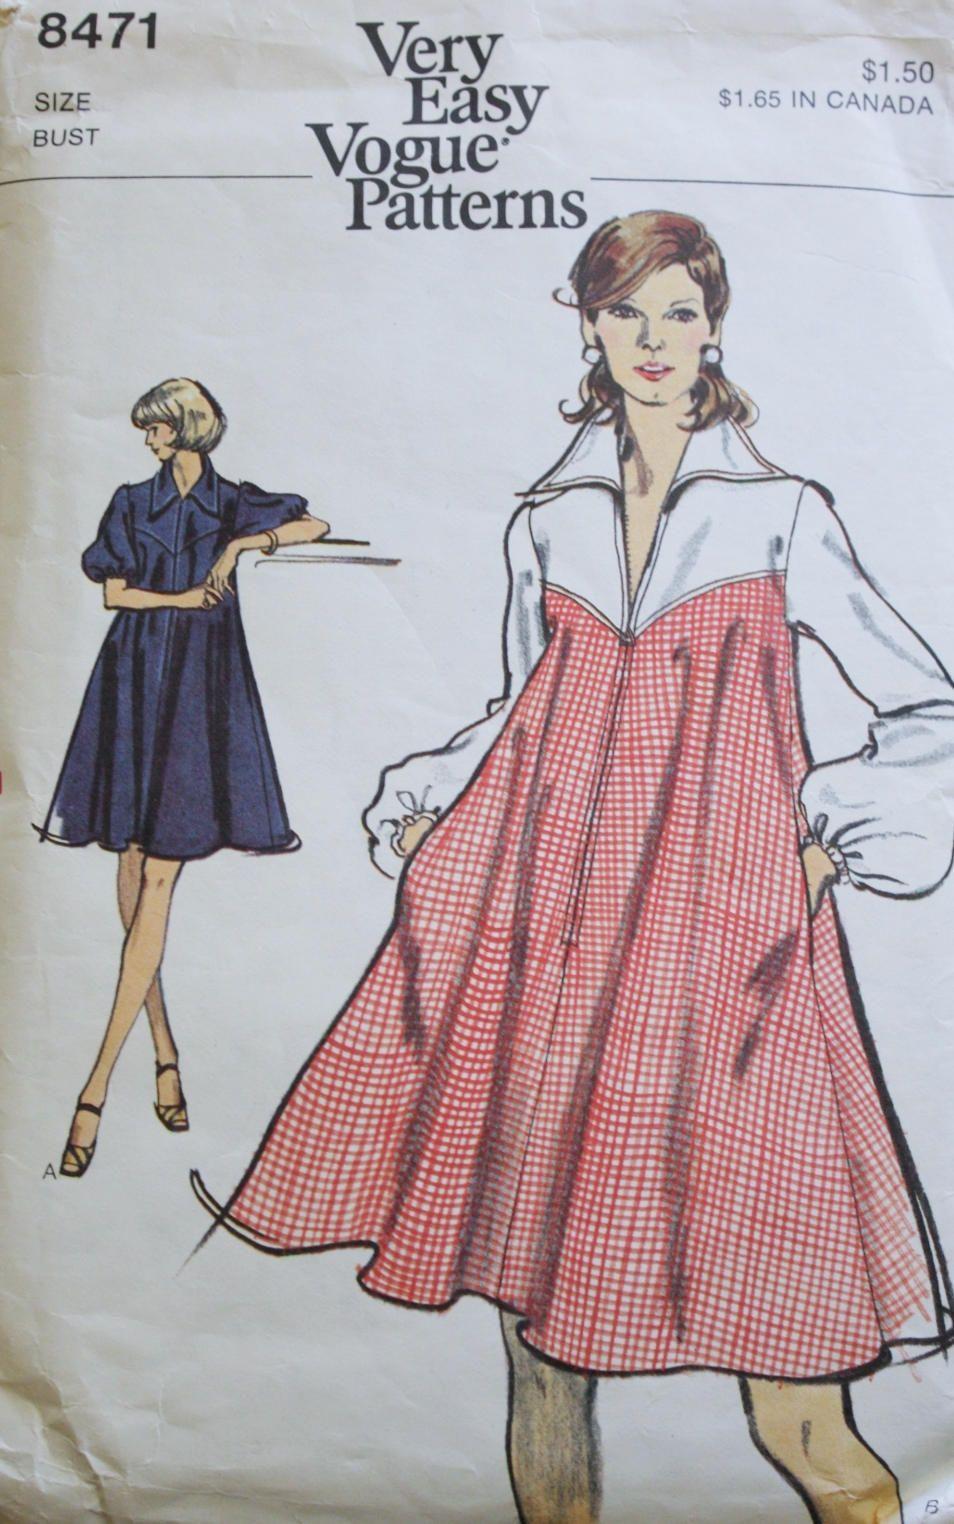 Vogue 8471, 60s Tent Dress Sewing Pattern, Size 12, Vogue Dress Pattern